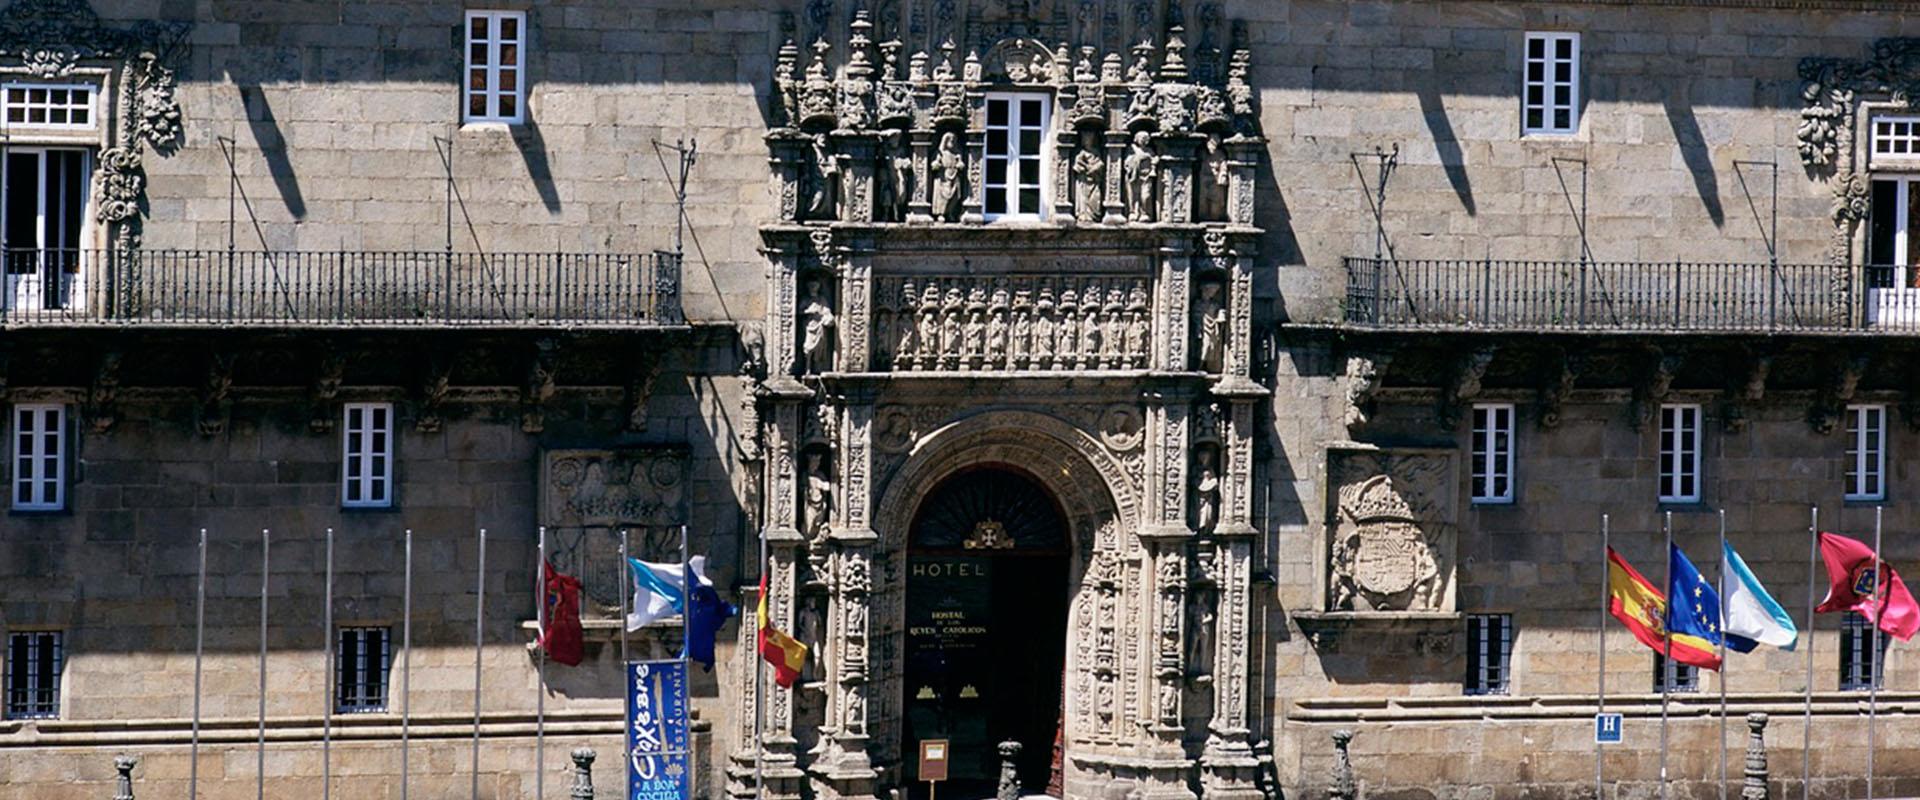 ETAPA 1: SANTIAGO DE COMPOSTELA